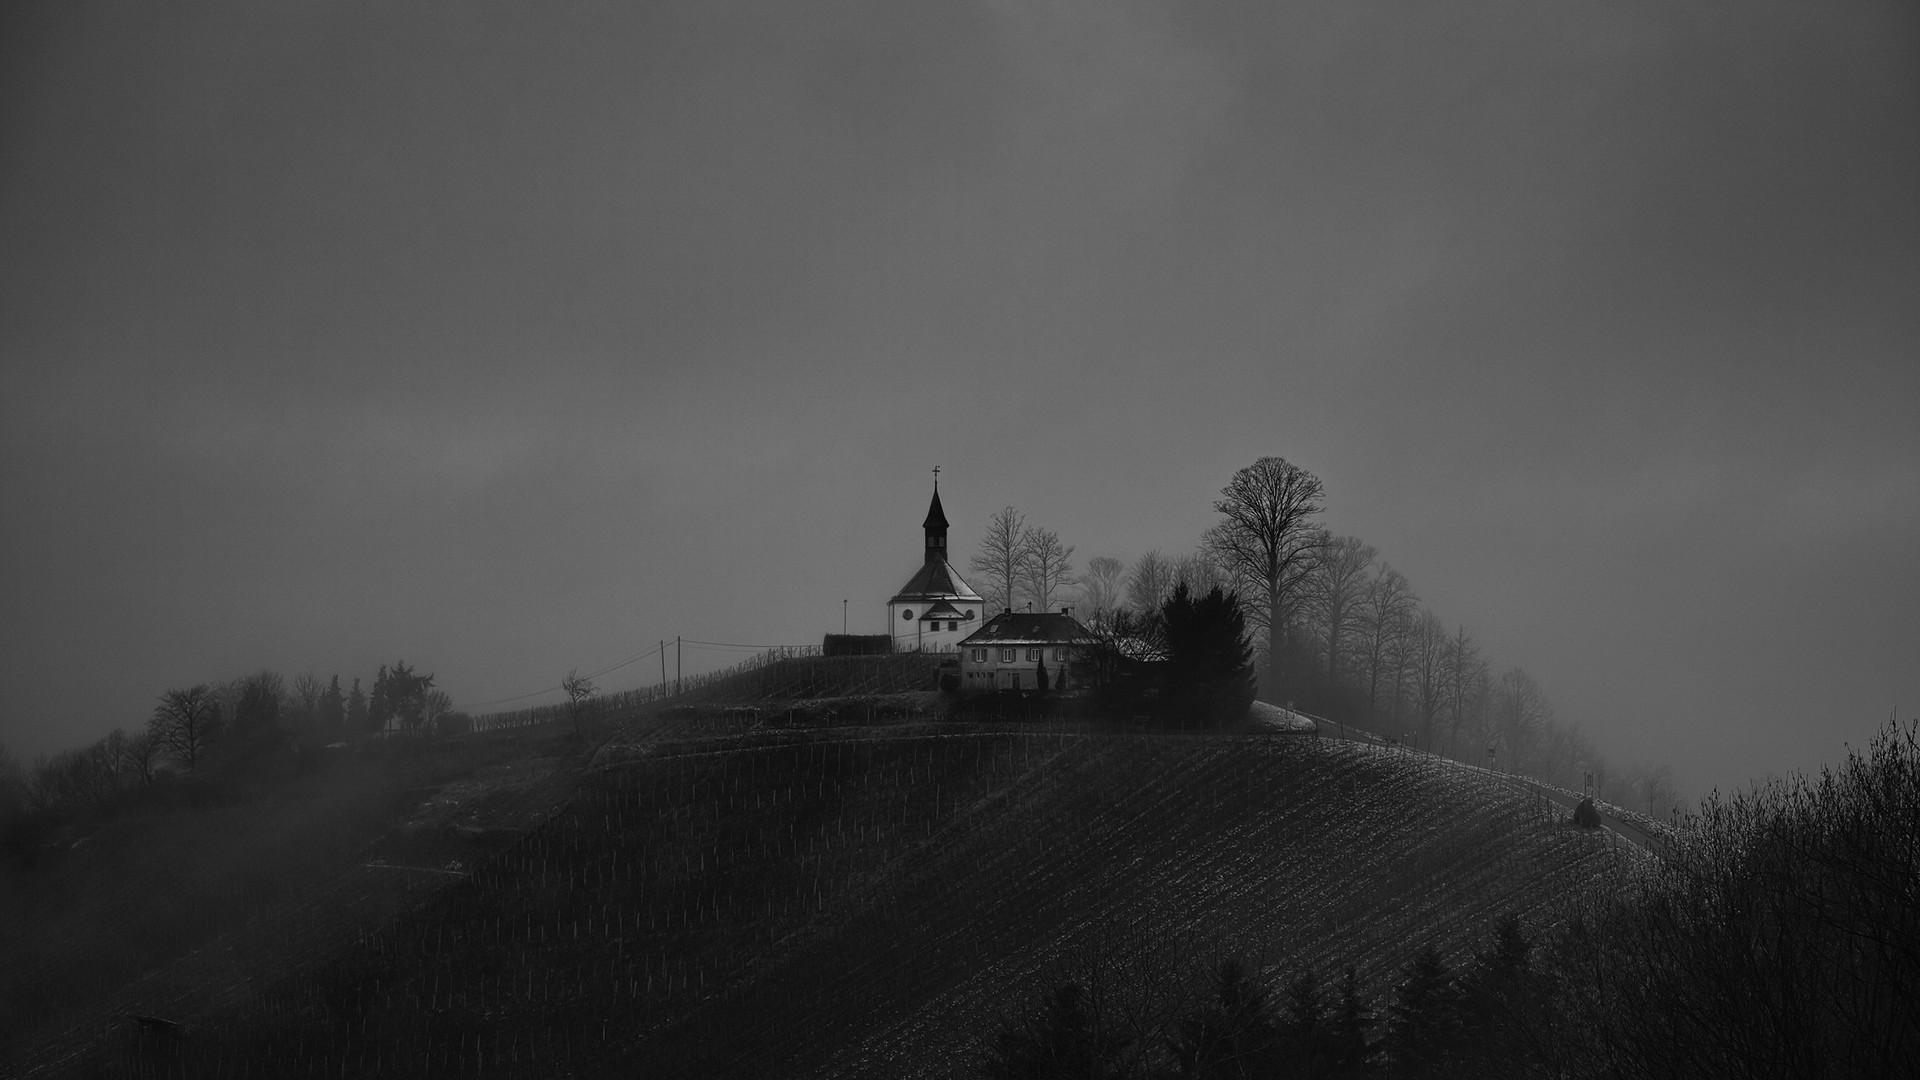 Res: 1920x1080, religious-magical-rural-hilltop-church-grayscale-trees-dark-